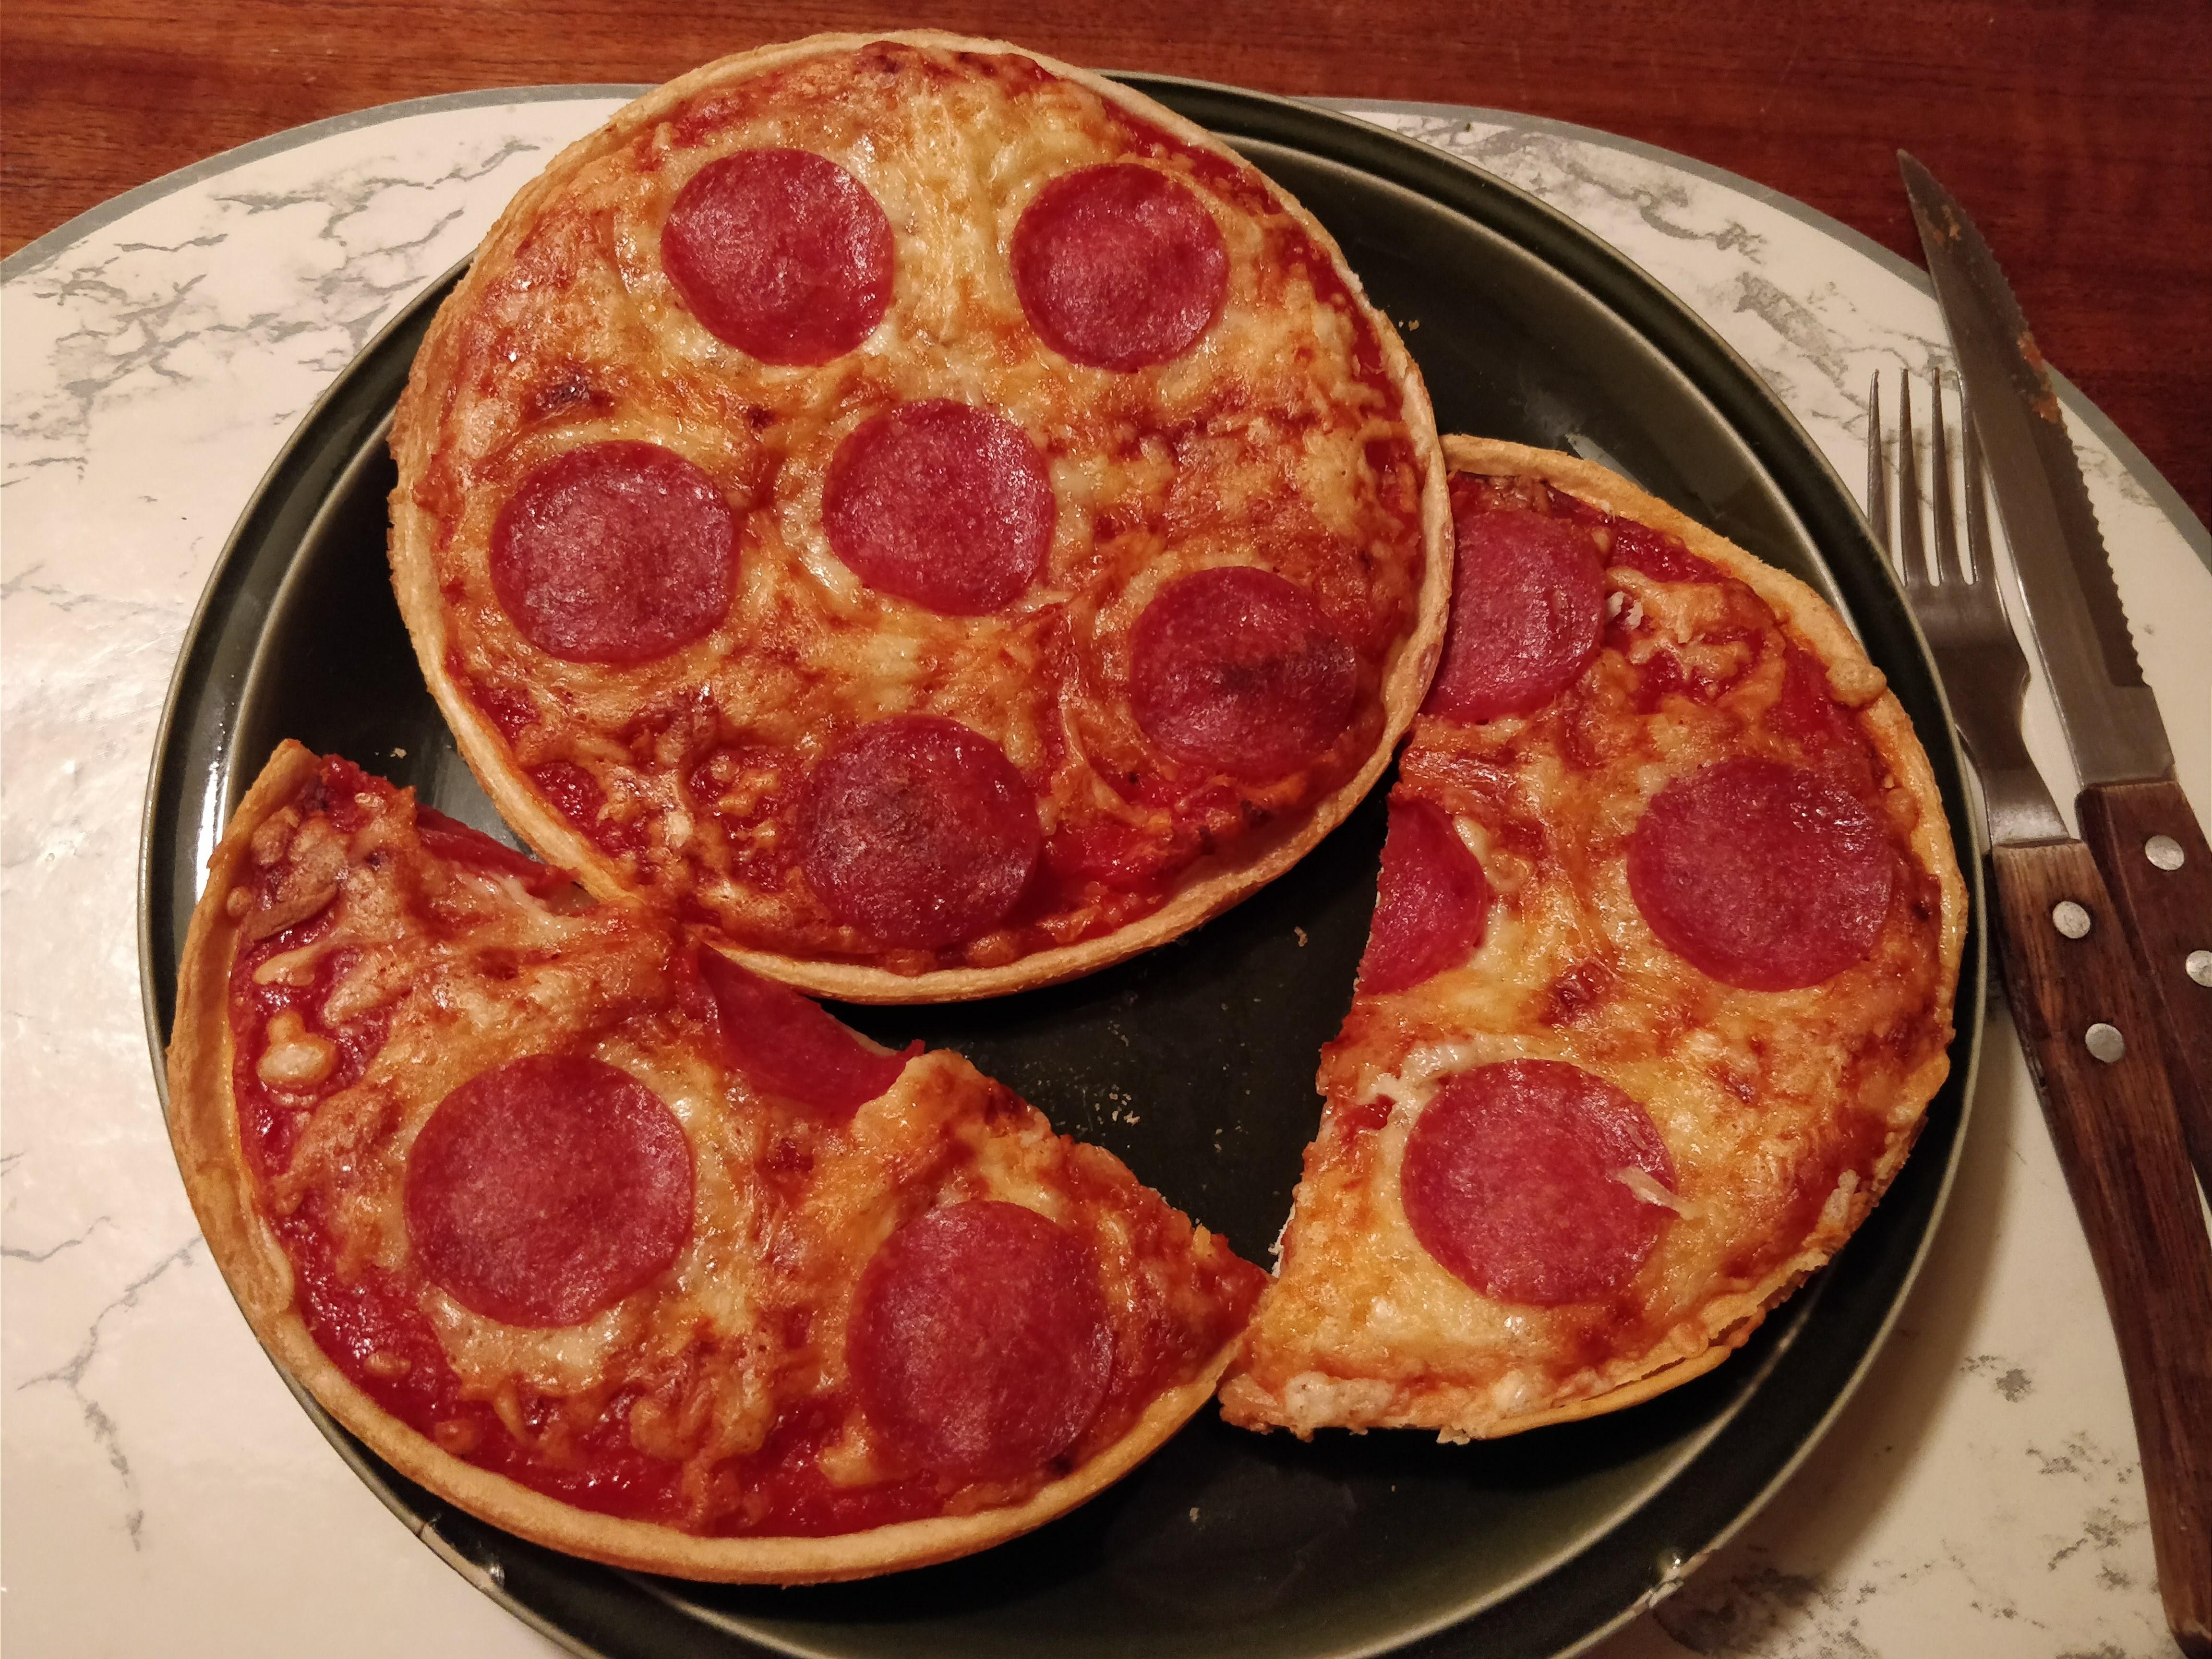 http://foodloader.net/nico_2017-12-26_zwei-mini-salami-pizzen.jpg